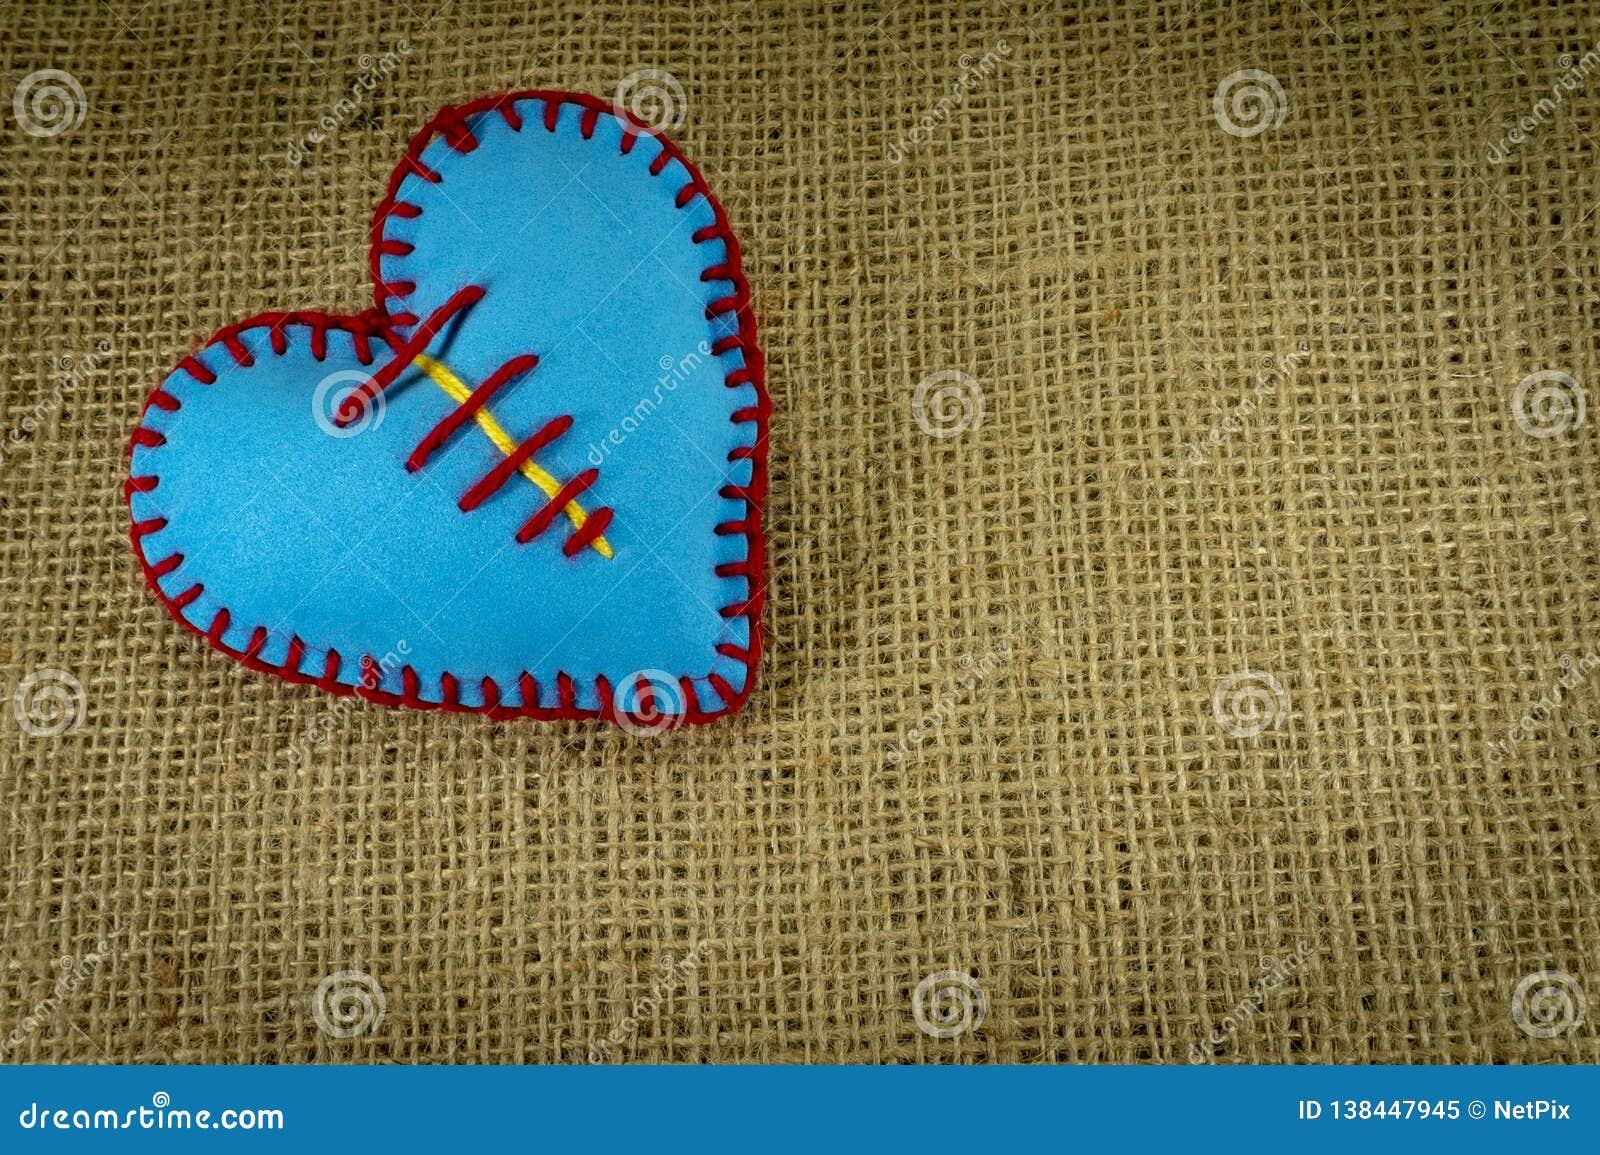 Hand Stitched Blue Foam Sheet Toy Heart On Jute Stock Image - Image